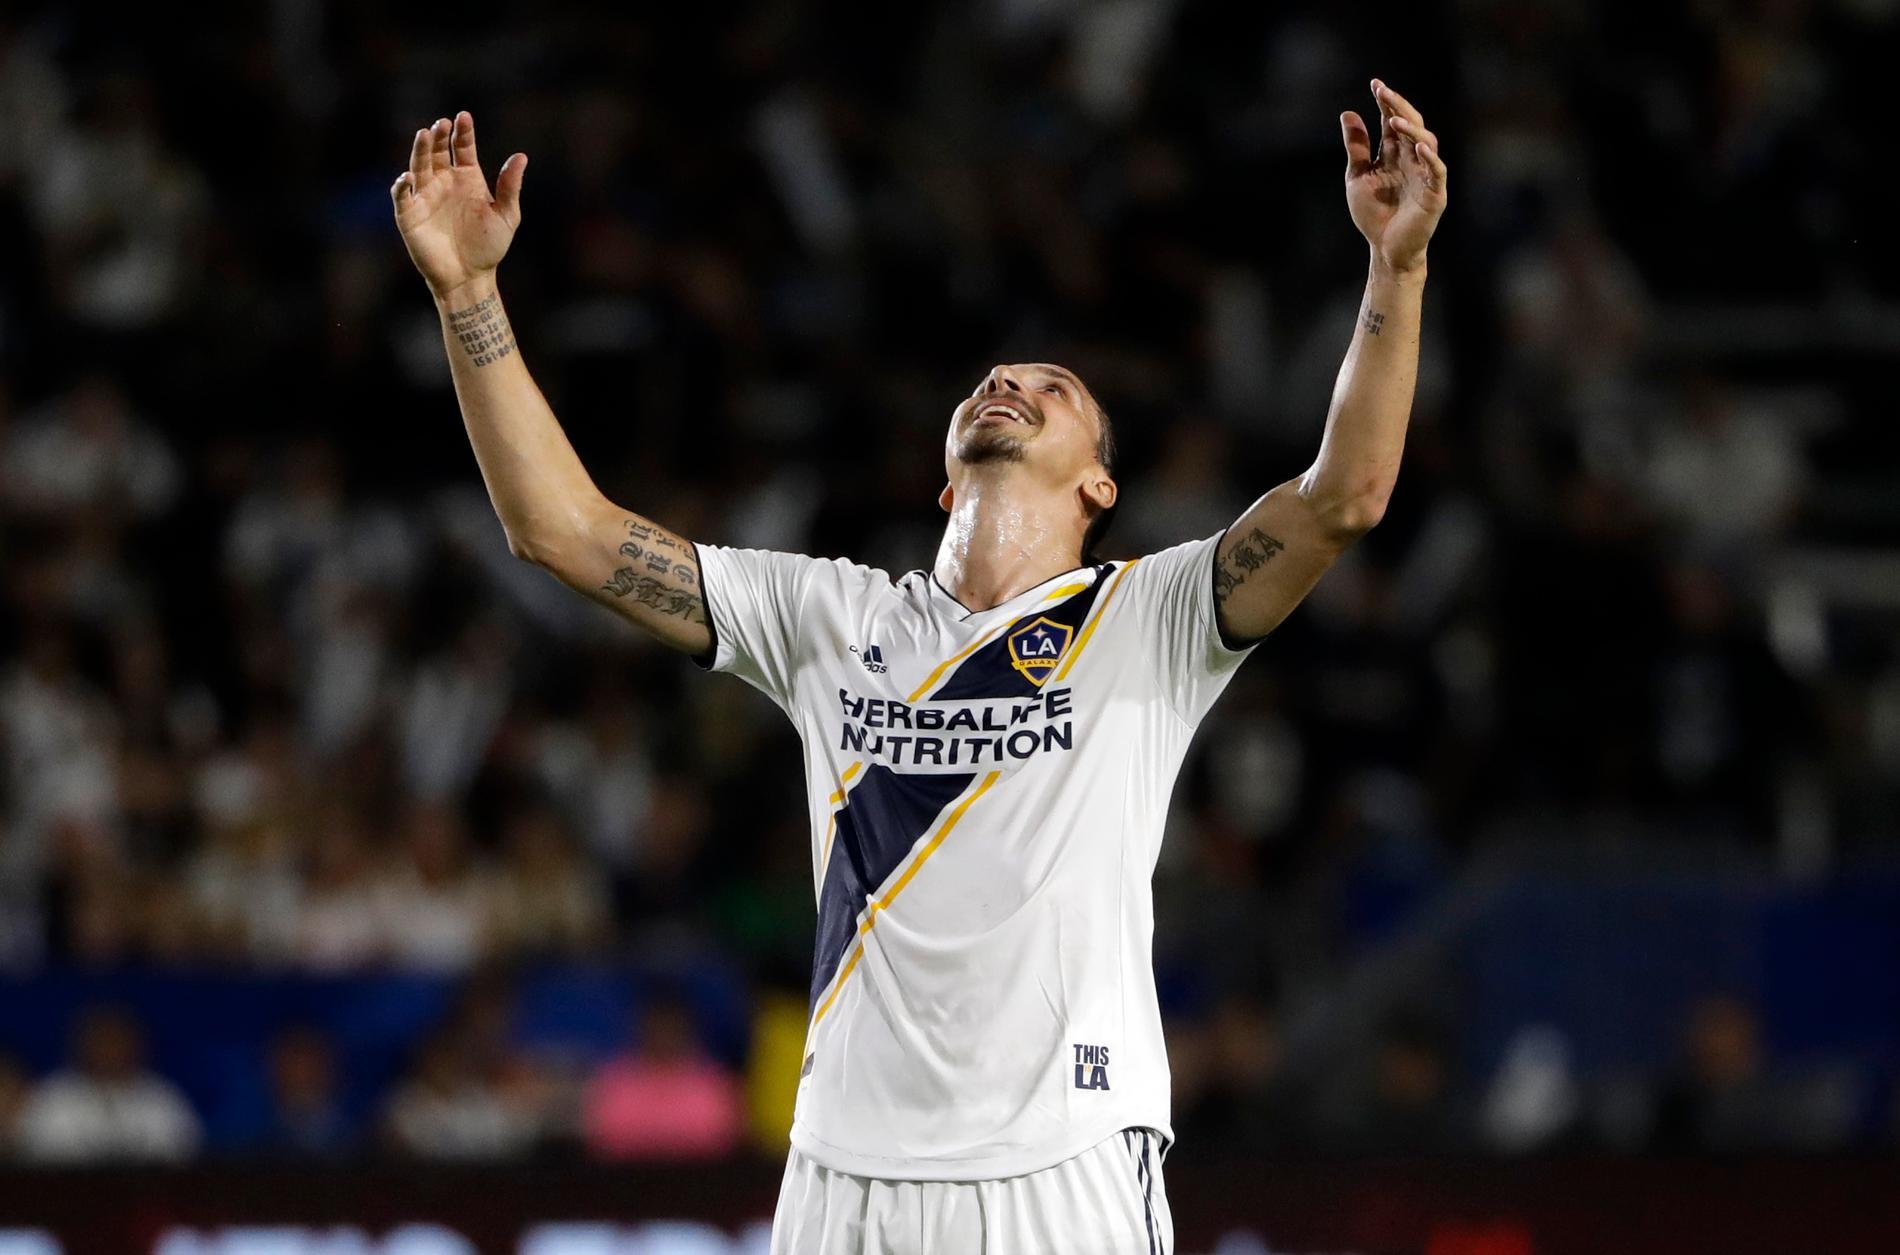 Zlatan Ibrahimovic missar MLS-slutspelet